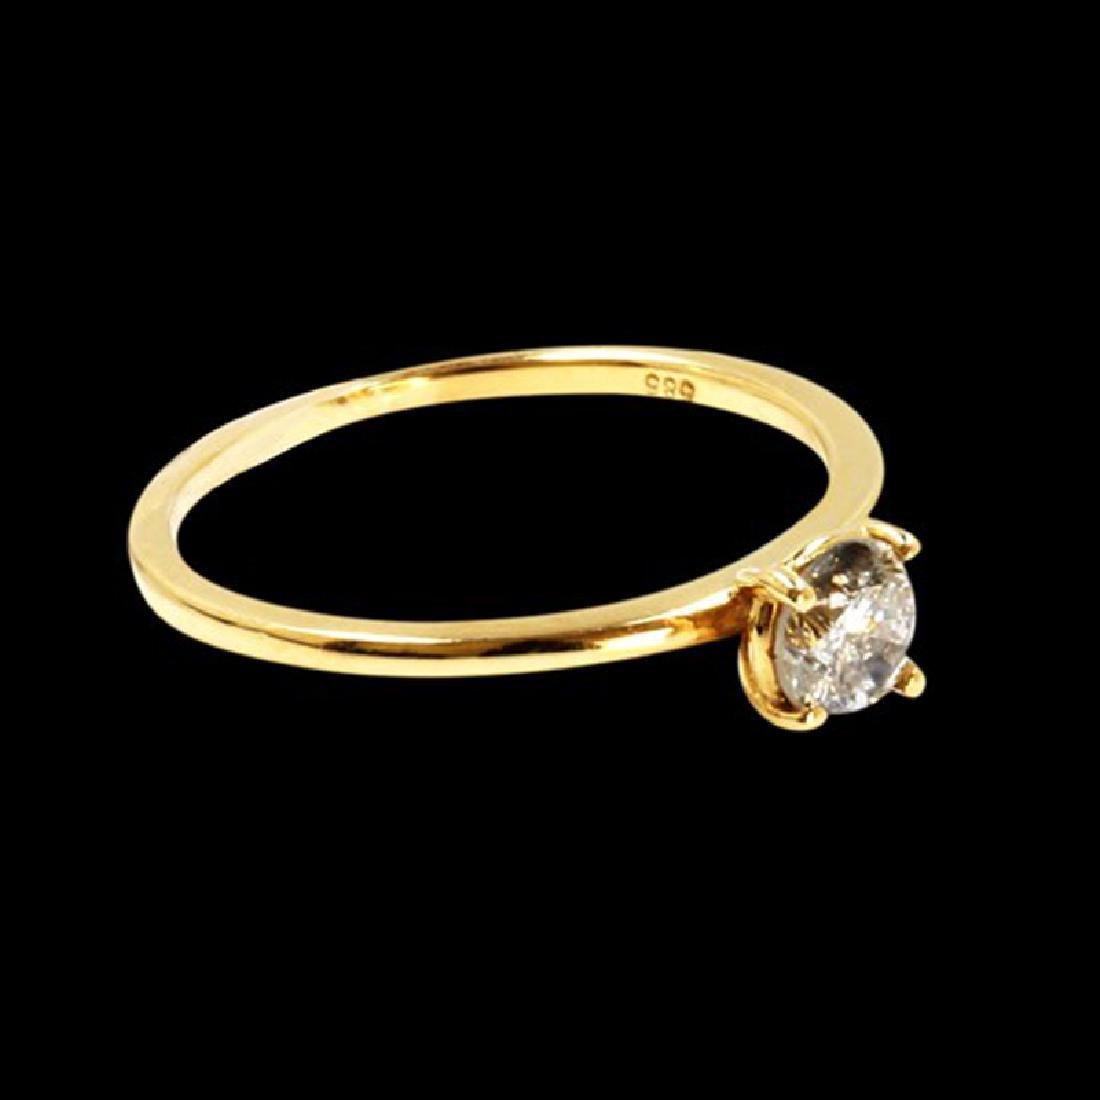 0.48CT NATURAL DIAMOND 14K YELLOW GOLD RING - 2